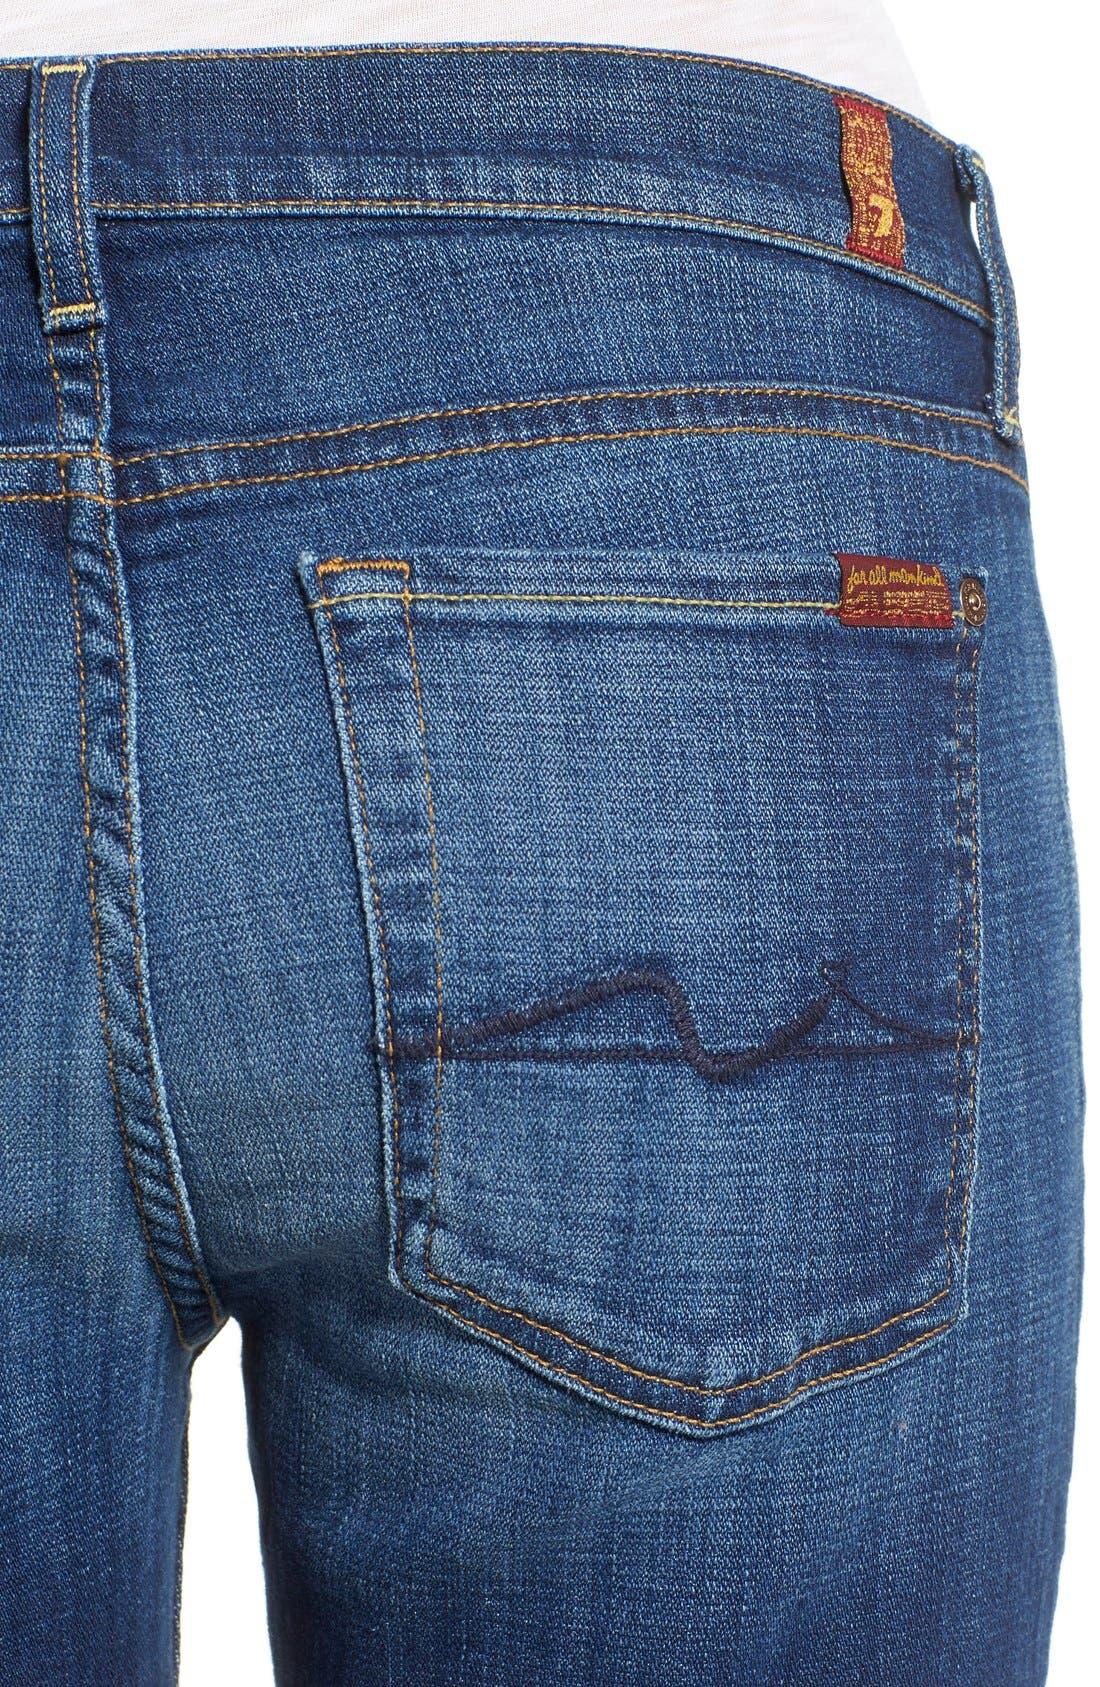 Josefina Boyfriend Jeans,                             Alternate thumbnail 34, color,